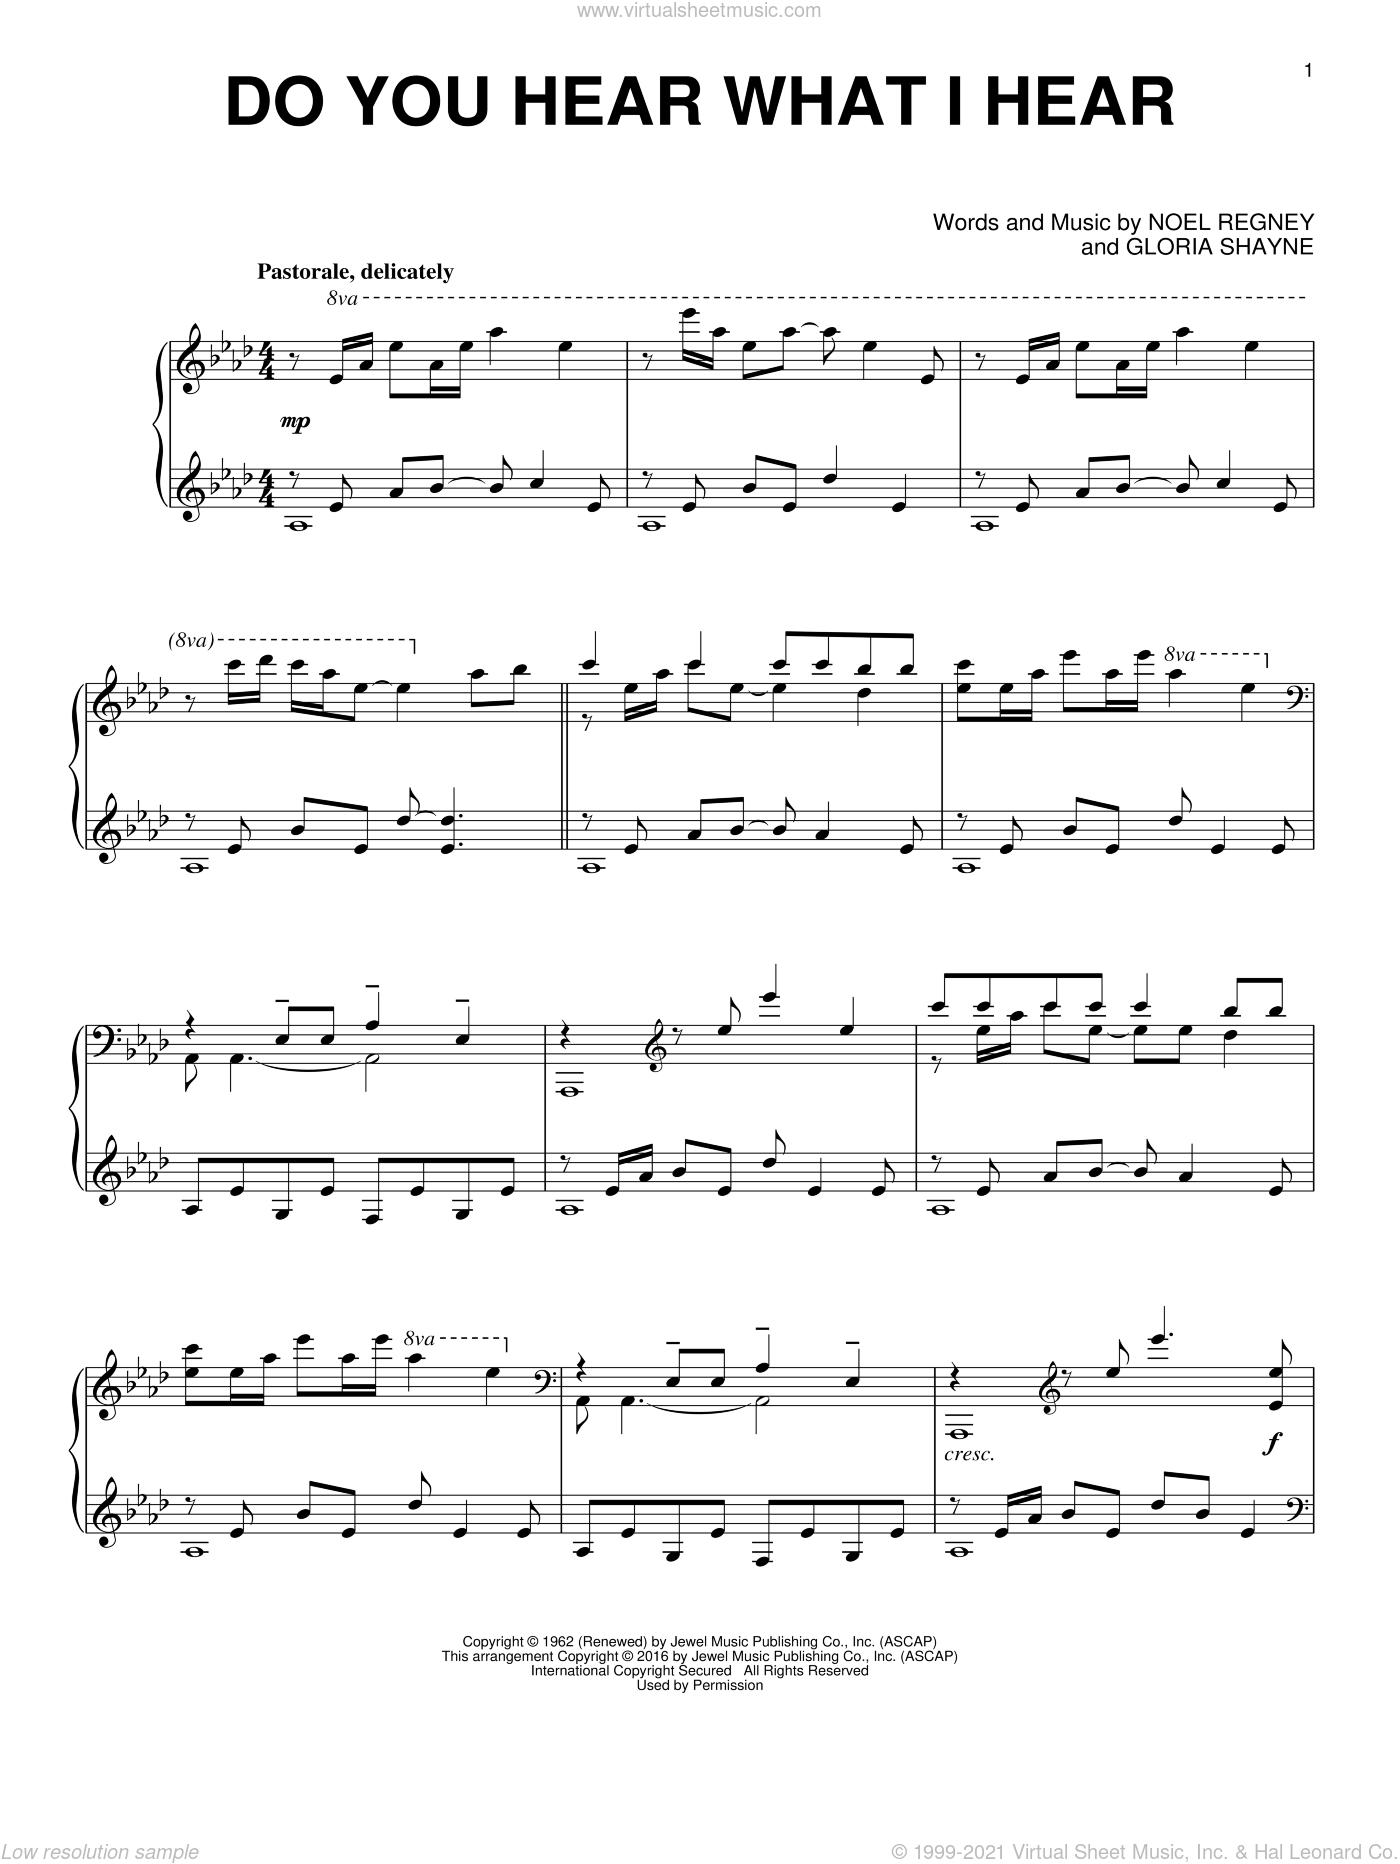 Do You Hear What I Hear sheet music for piano solo by Gloria Shayne, Carole King and Noel Regney, intermediate skill level